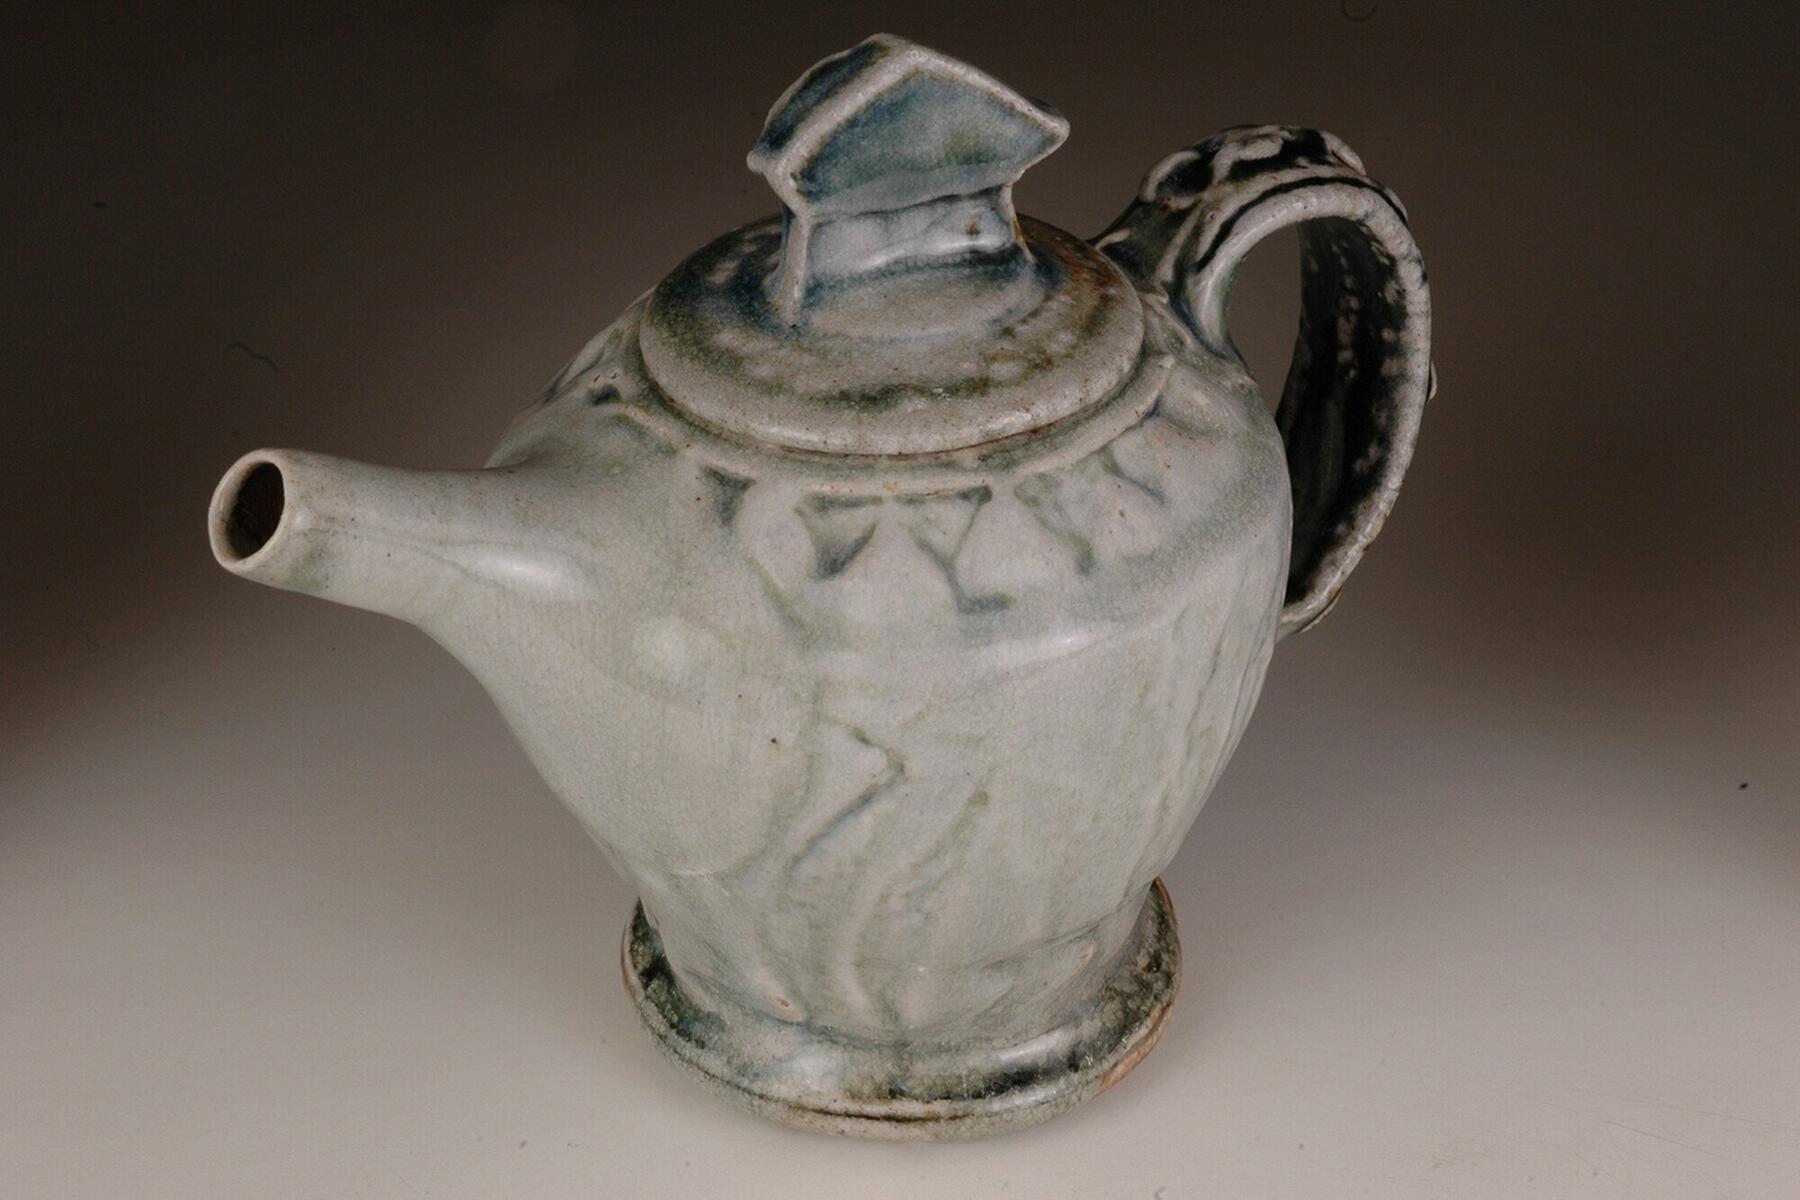 Jeremy Steward wood fired salt glaze teapot